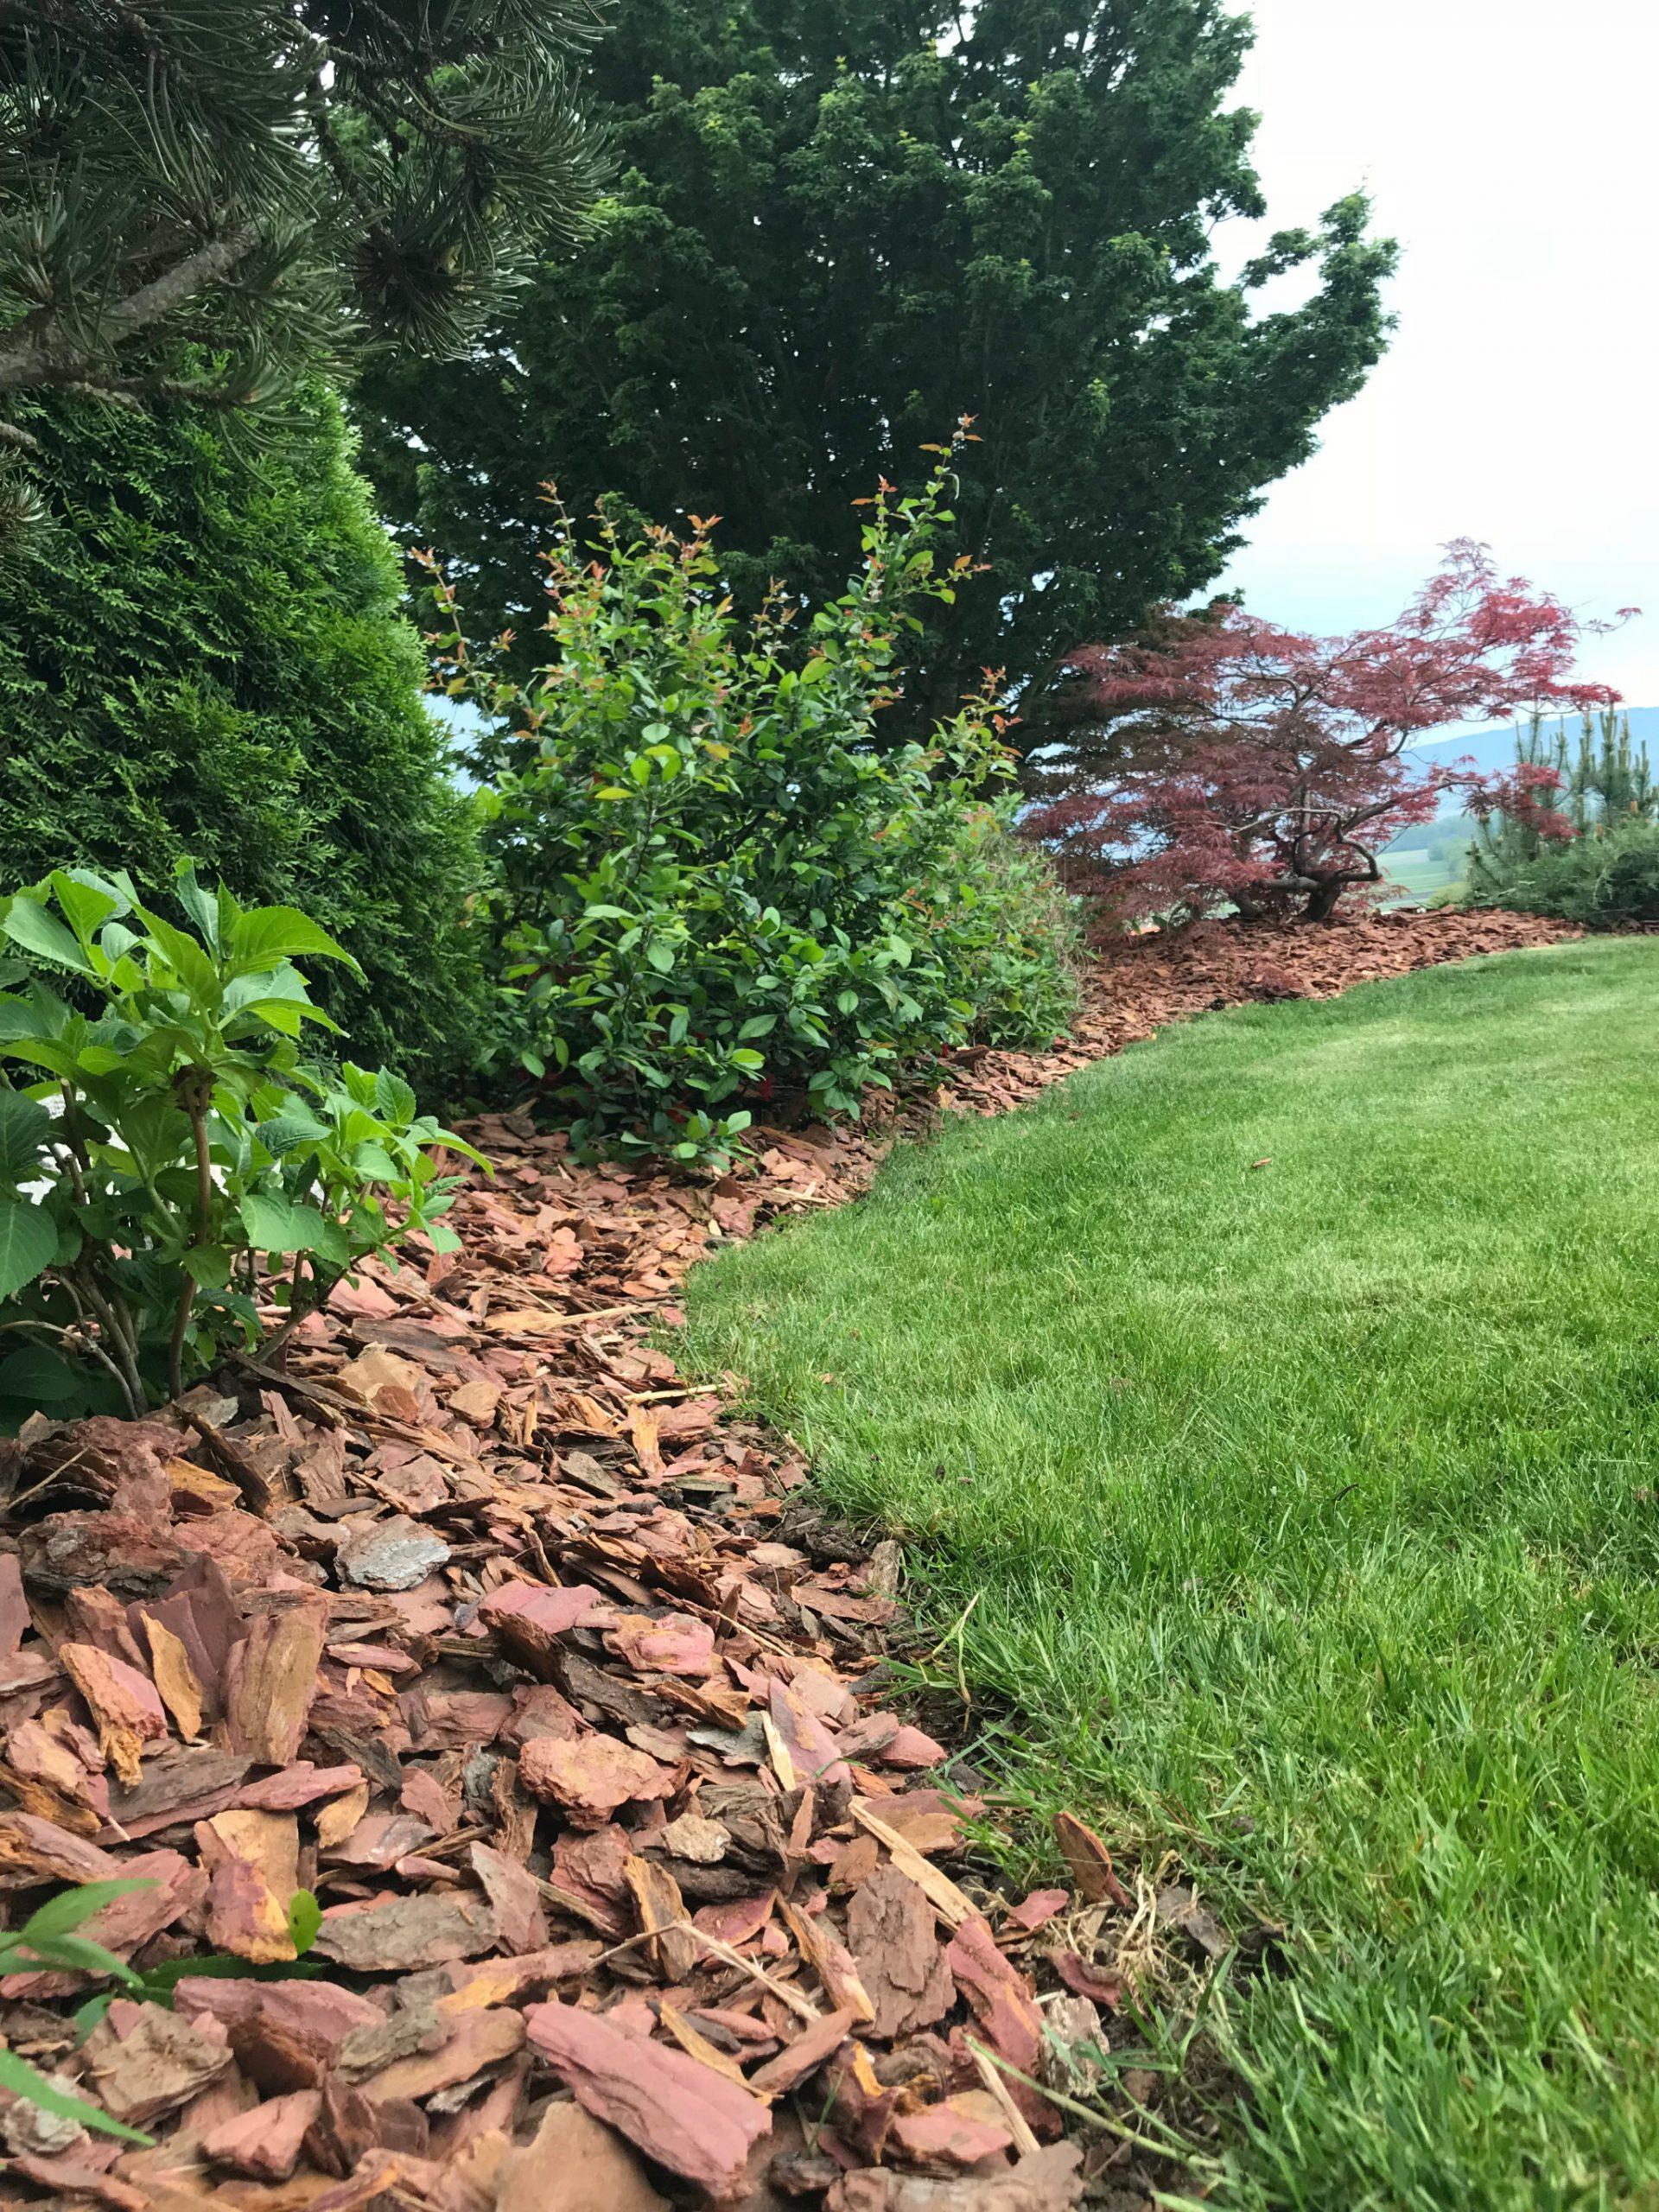 Meldung: Ecorces De Mélèze – Ricoter Erdaufbereitung Ag encequiconcerne Ecorces Jardin